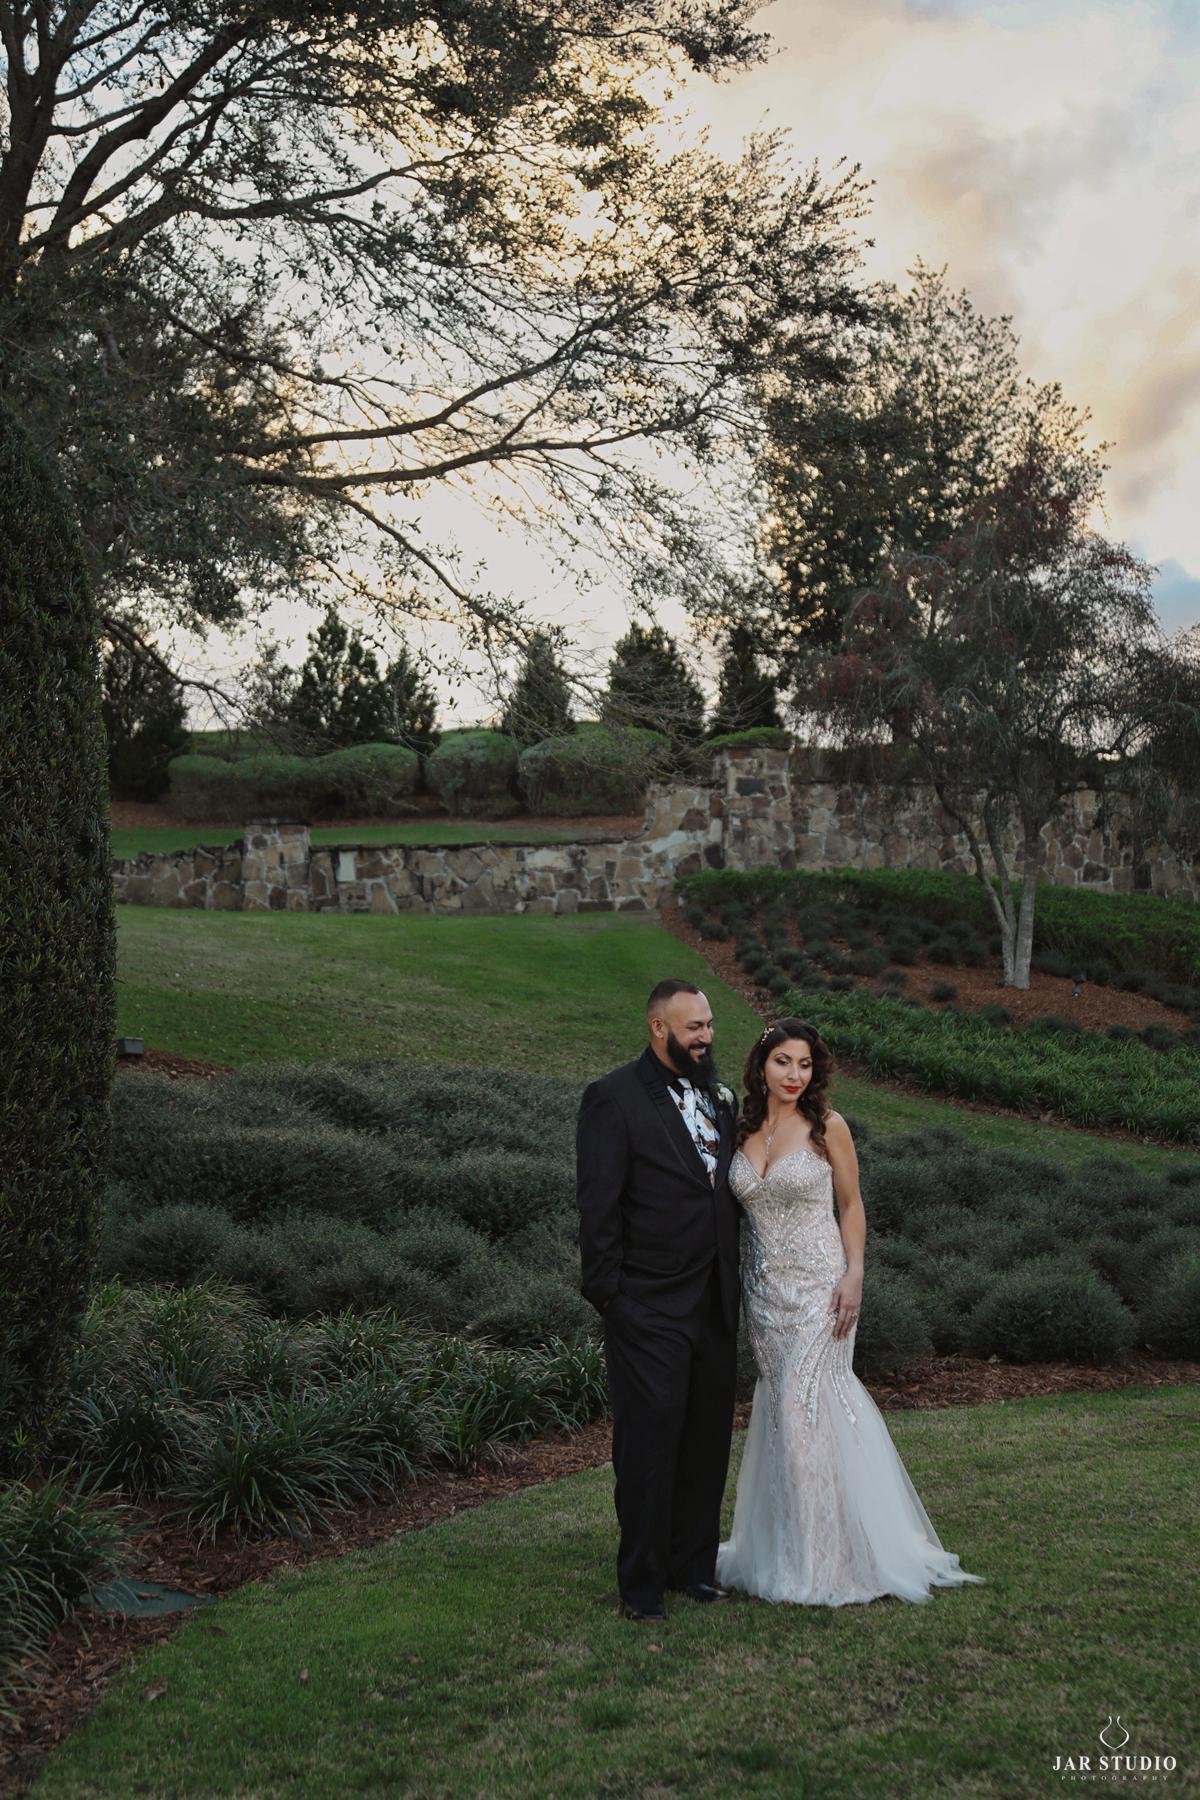 22-stylish-bride-groom-jarstudio-photography.jpg